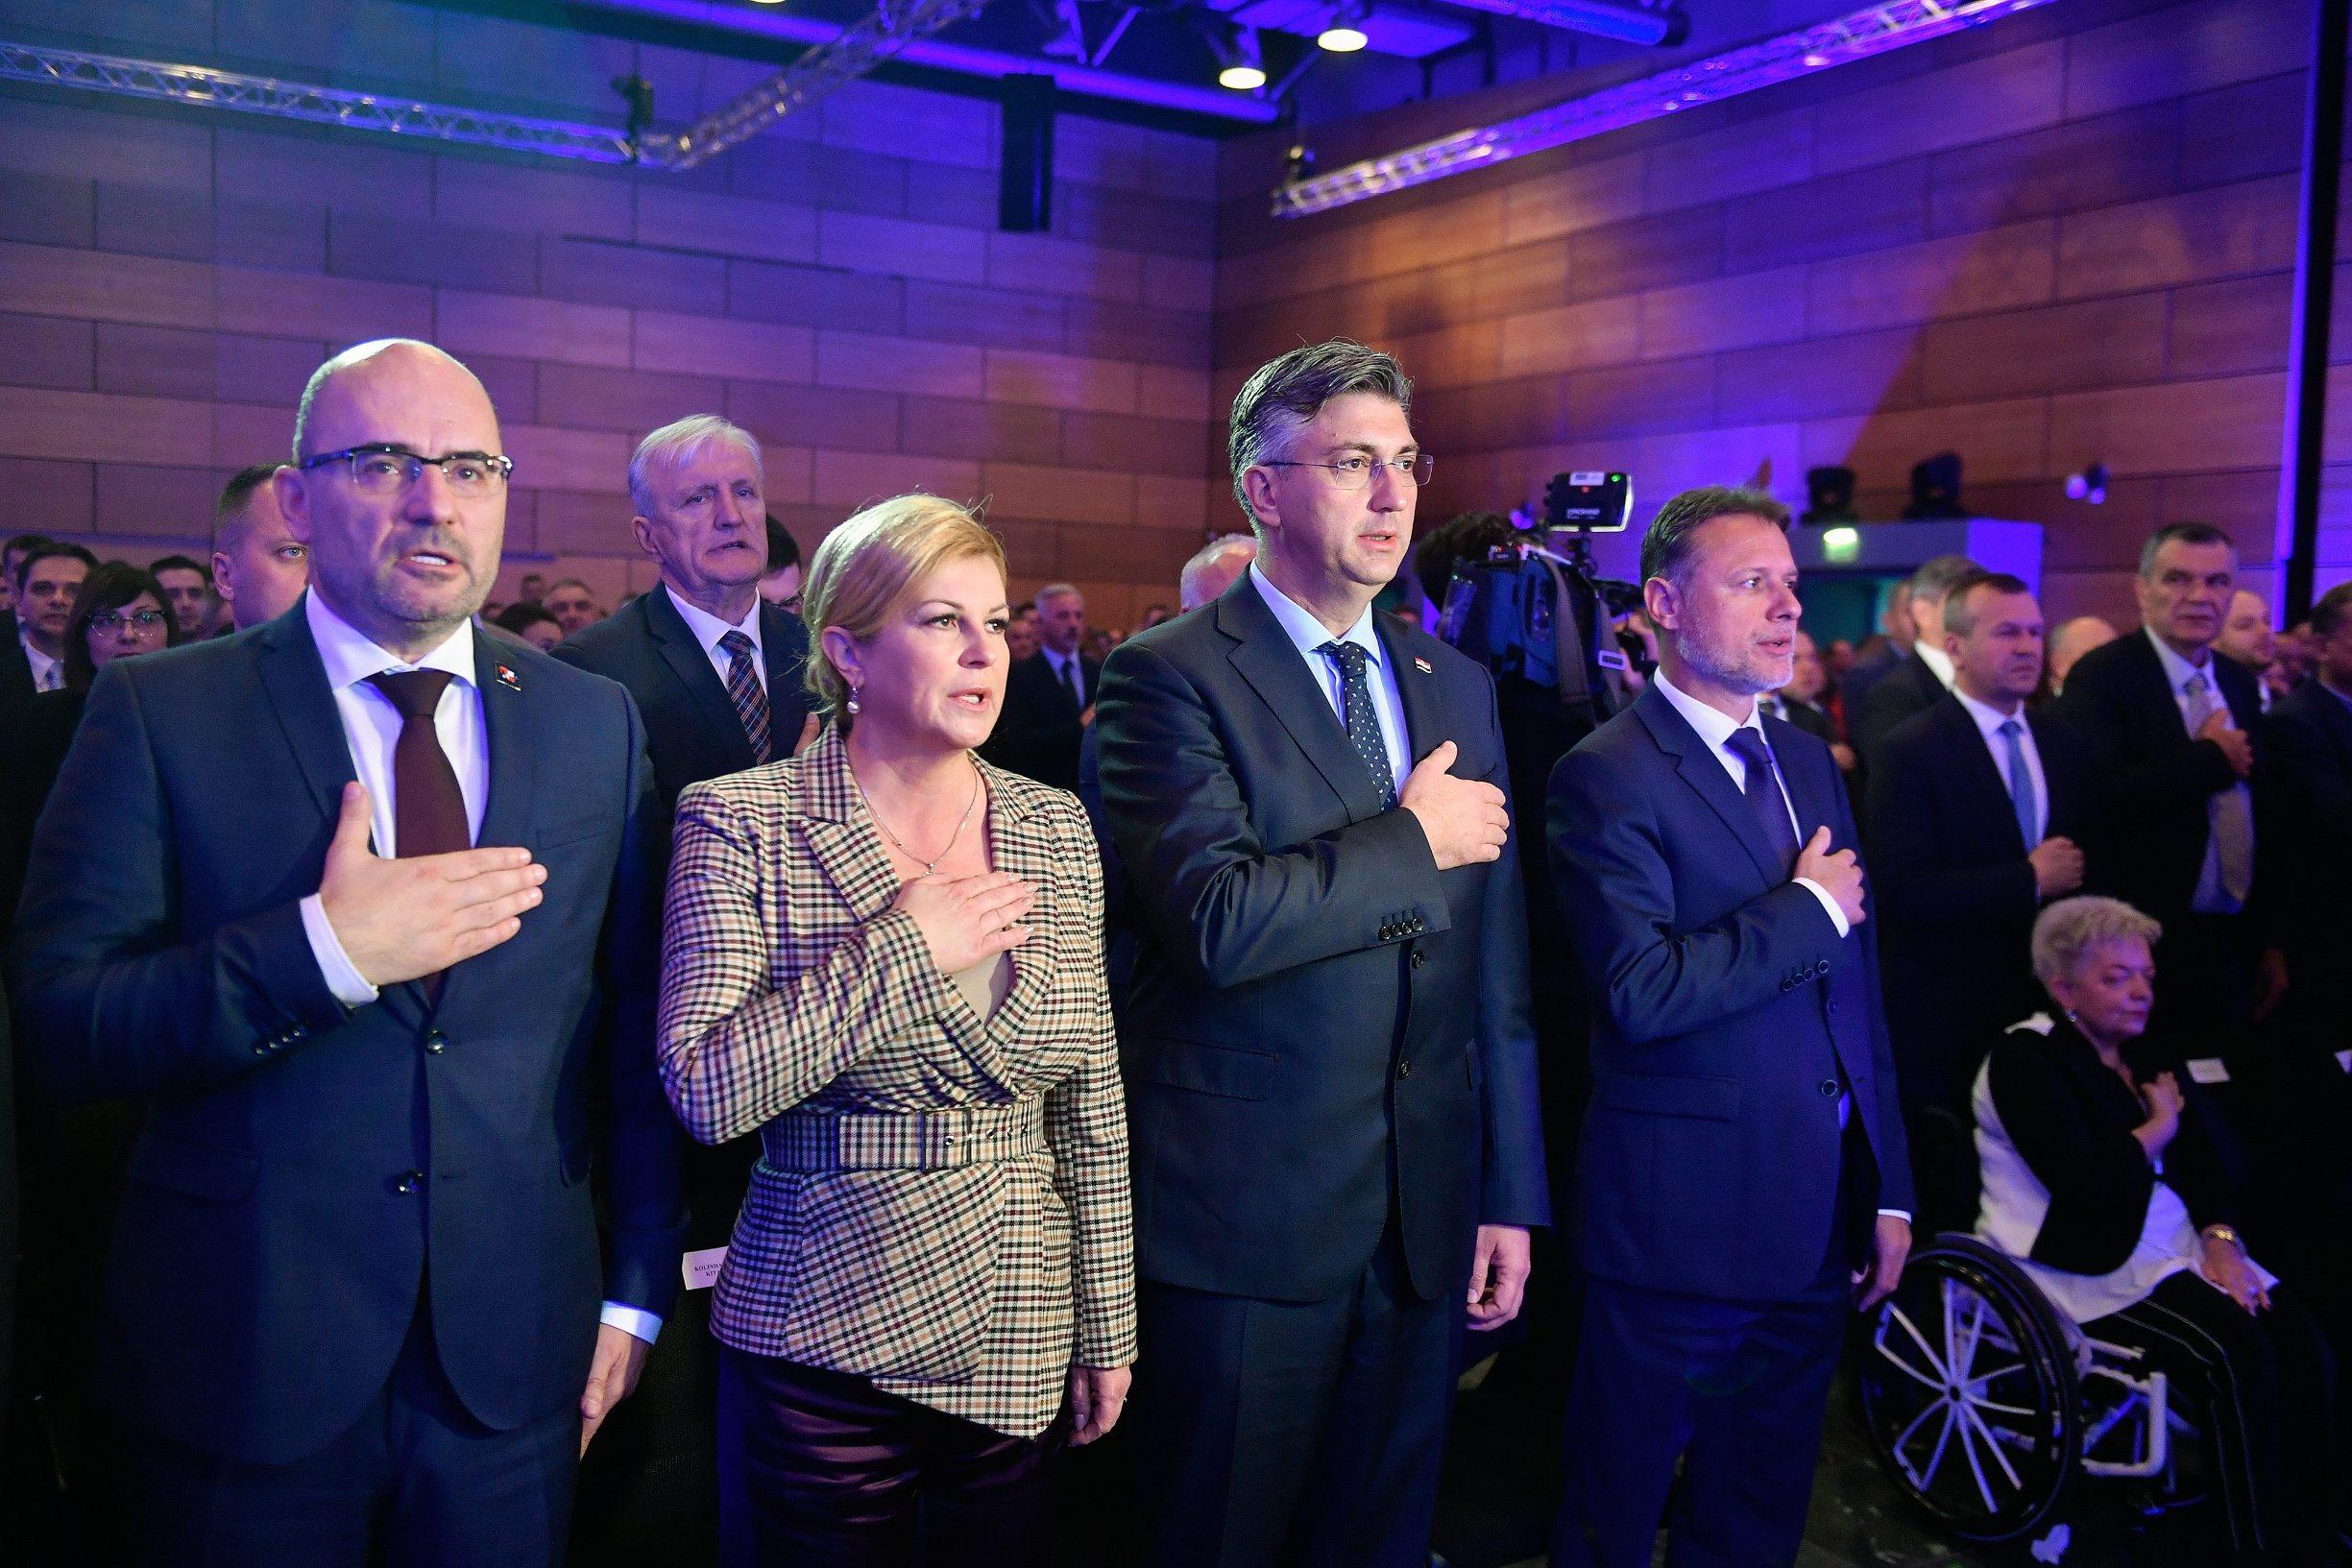 Na fotografiji: Kolinda Grabar-Kitarović, Andrej Plenković, Gordan Jandroković, Milijan Brkić